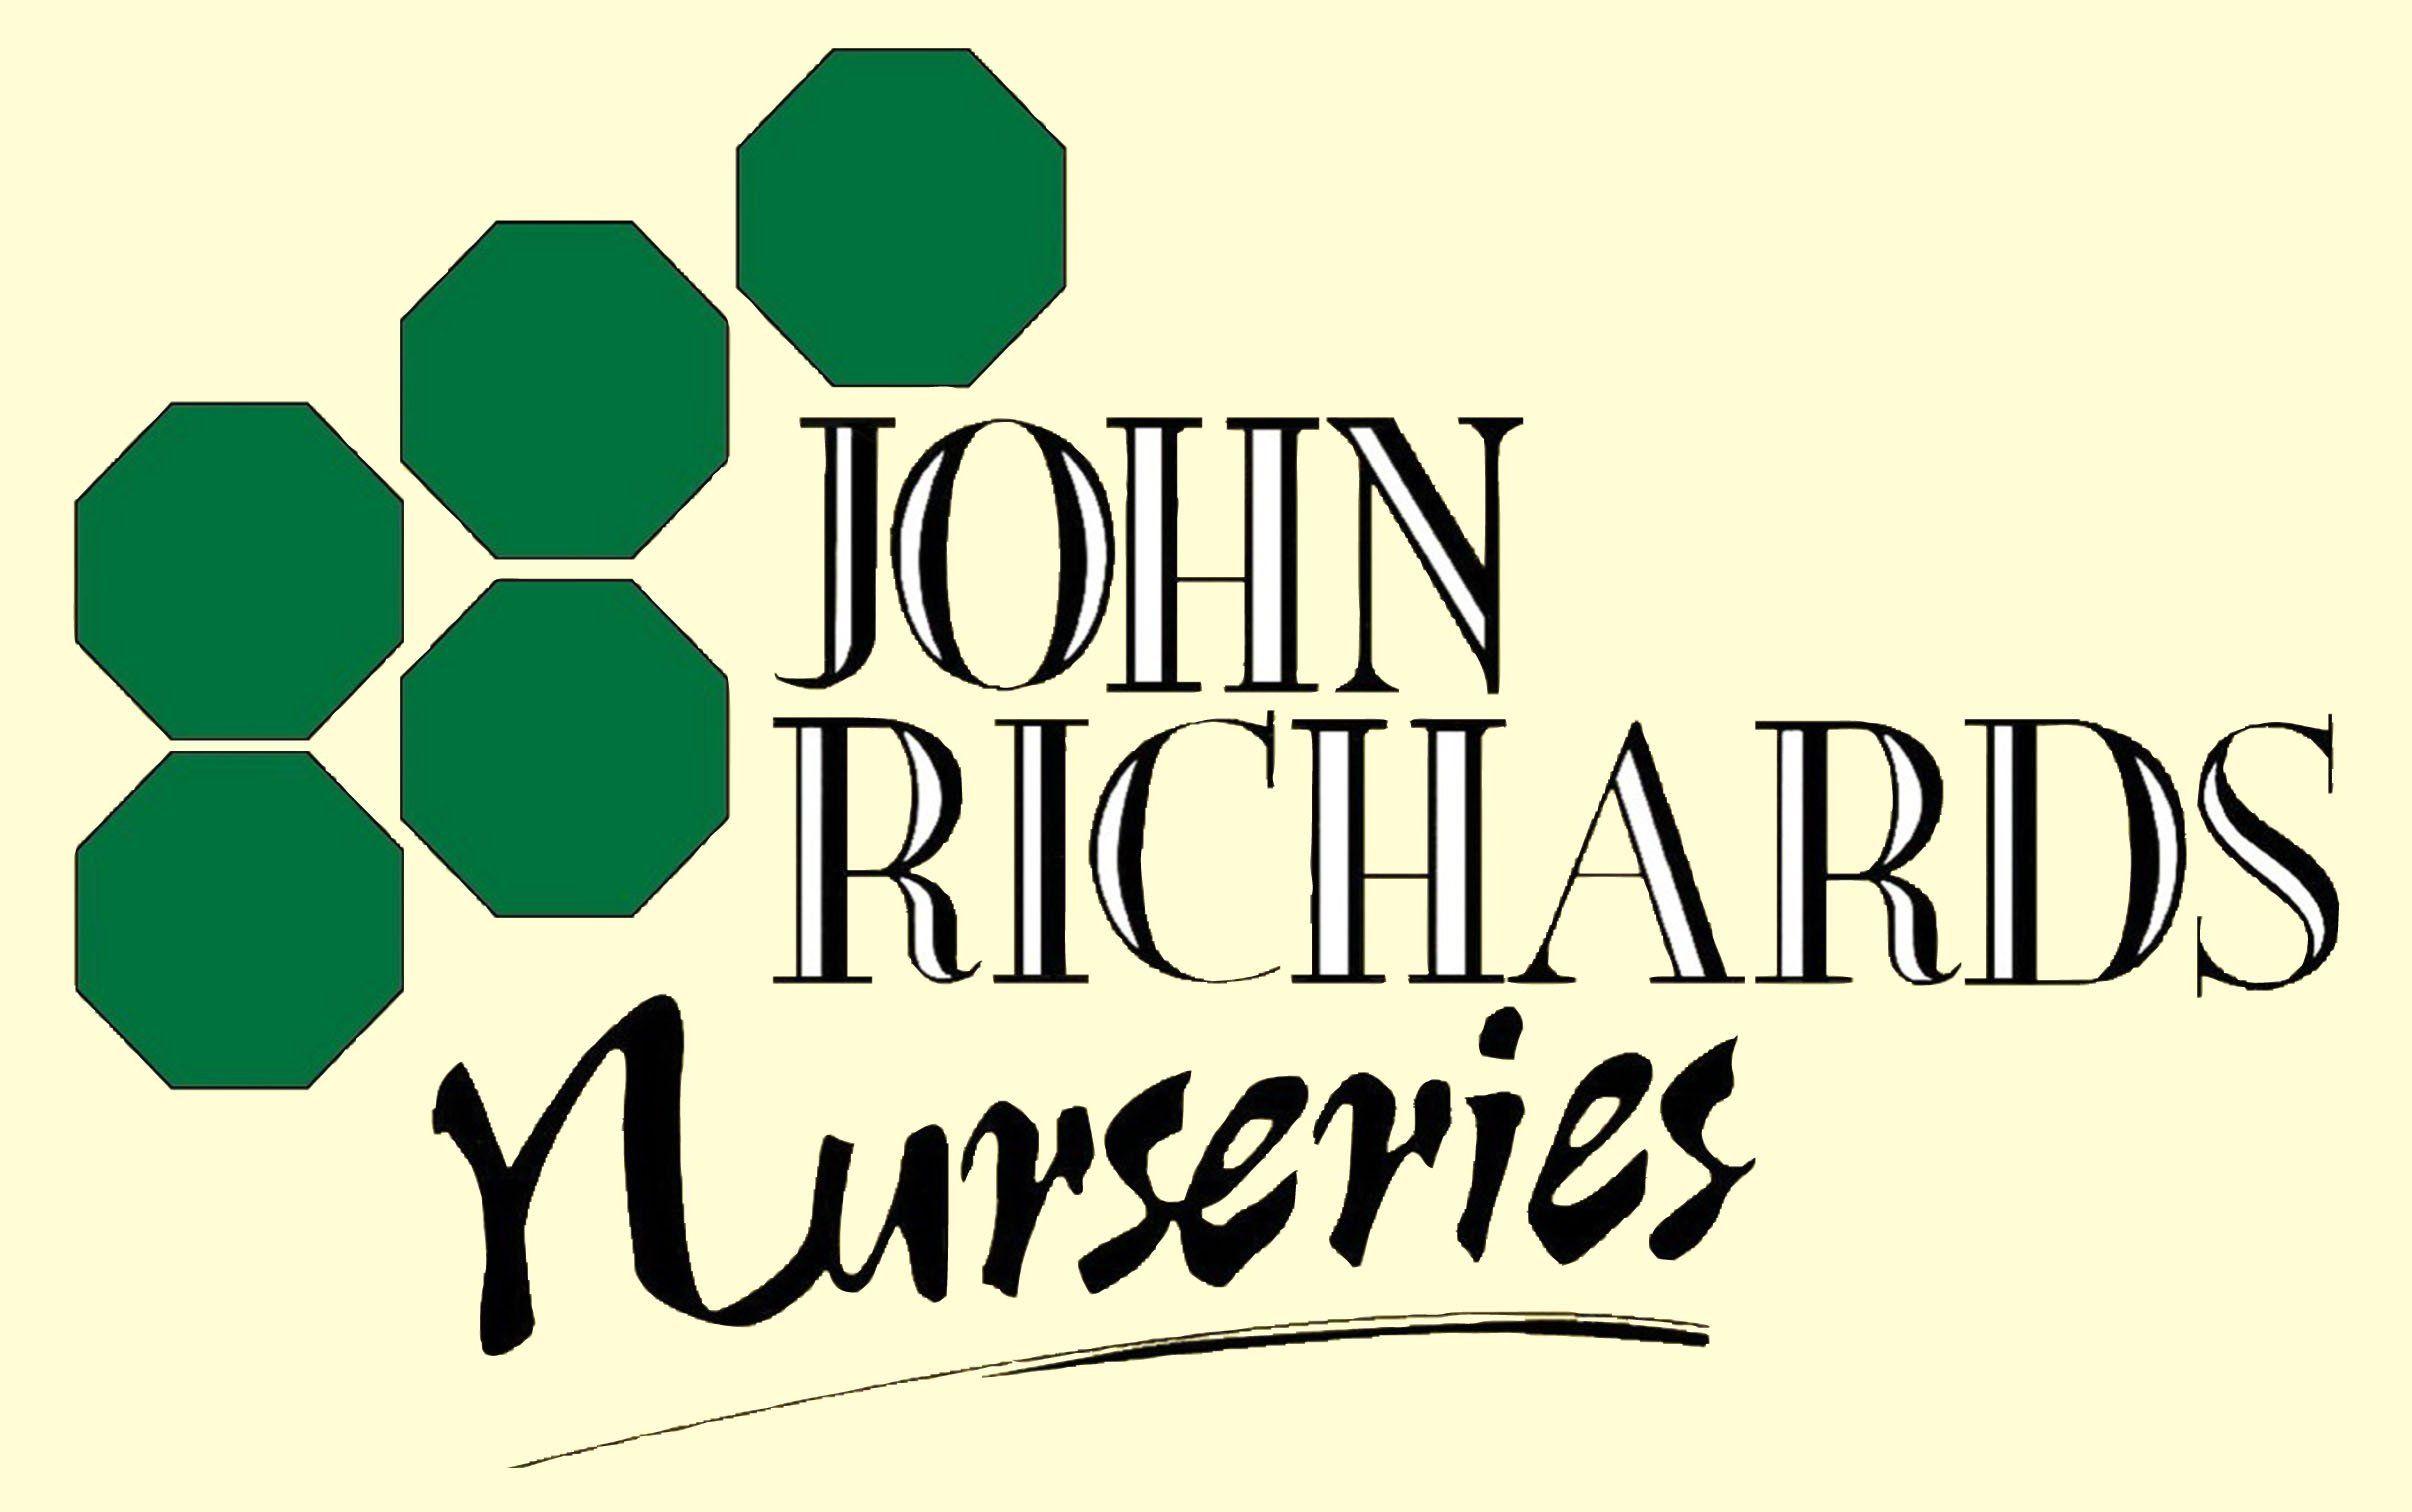 John Richards Nurseries Ltd - NB69